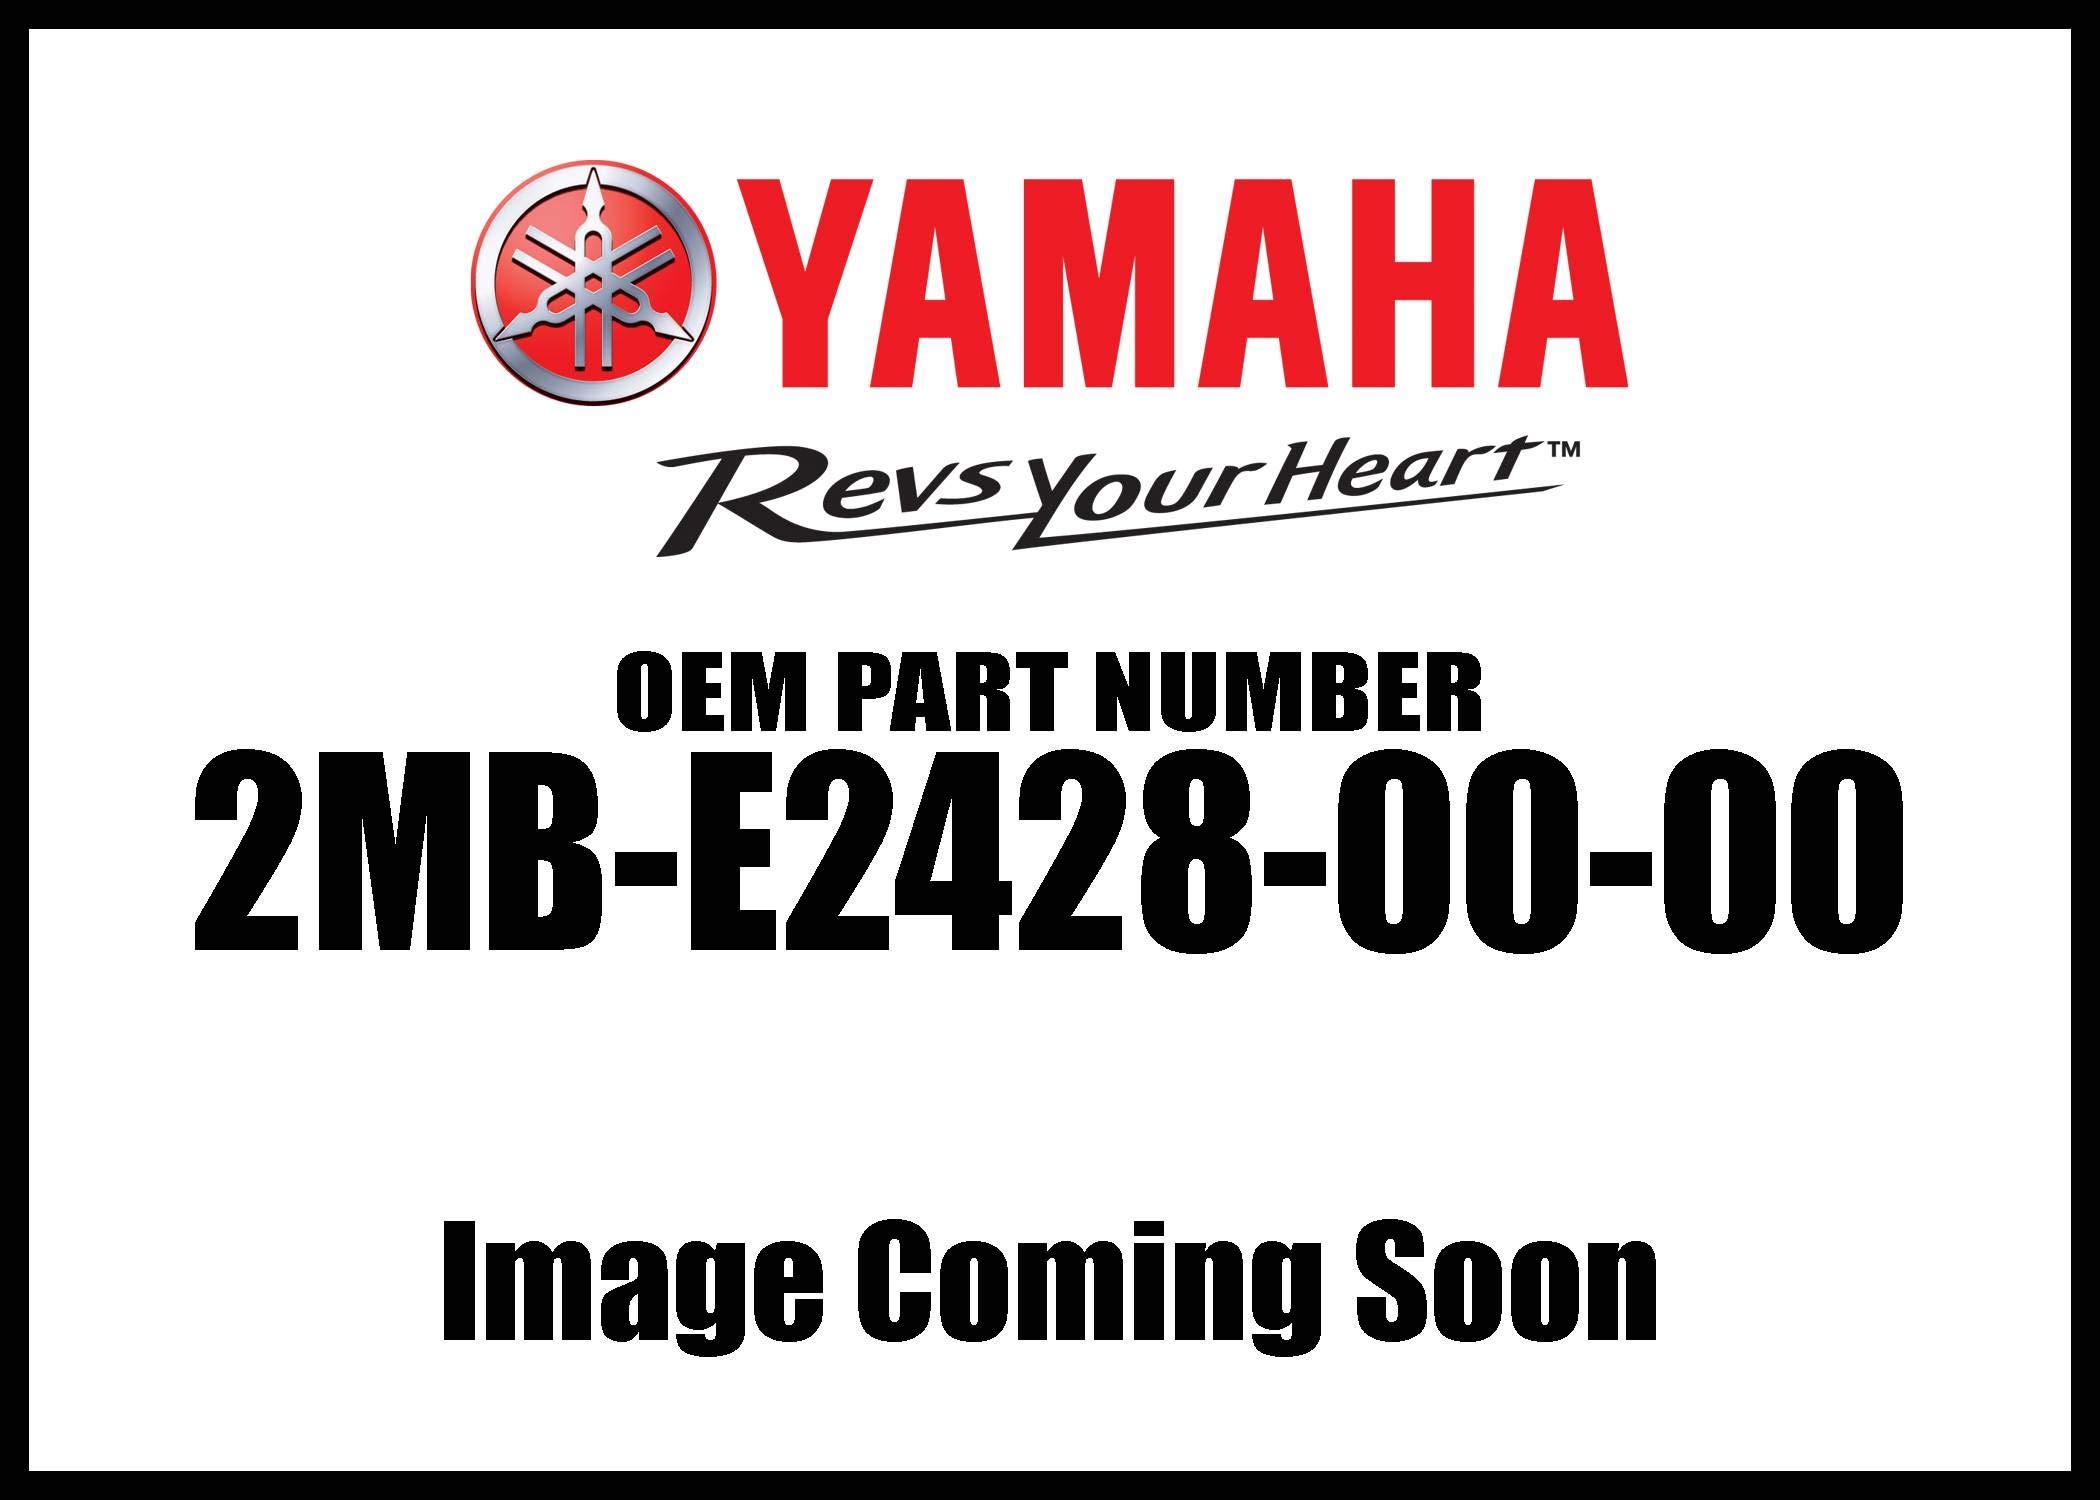 Yamaha New OEM 2MB-E2428-00-00 Gasket, HOUSING CO 2MBE24280000